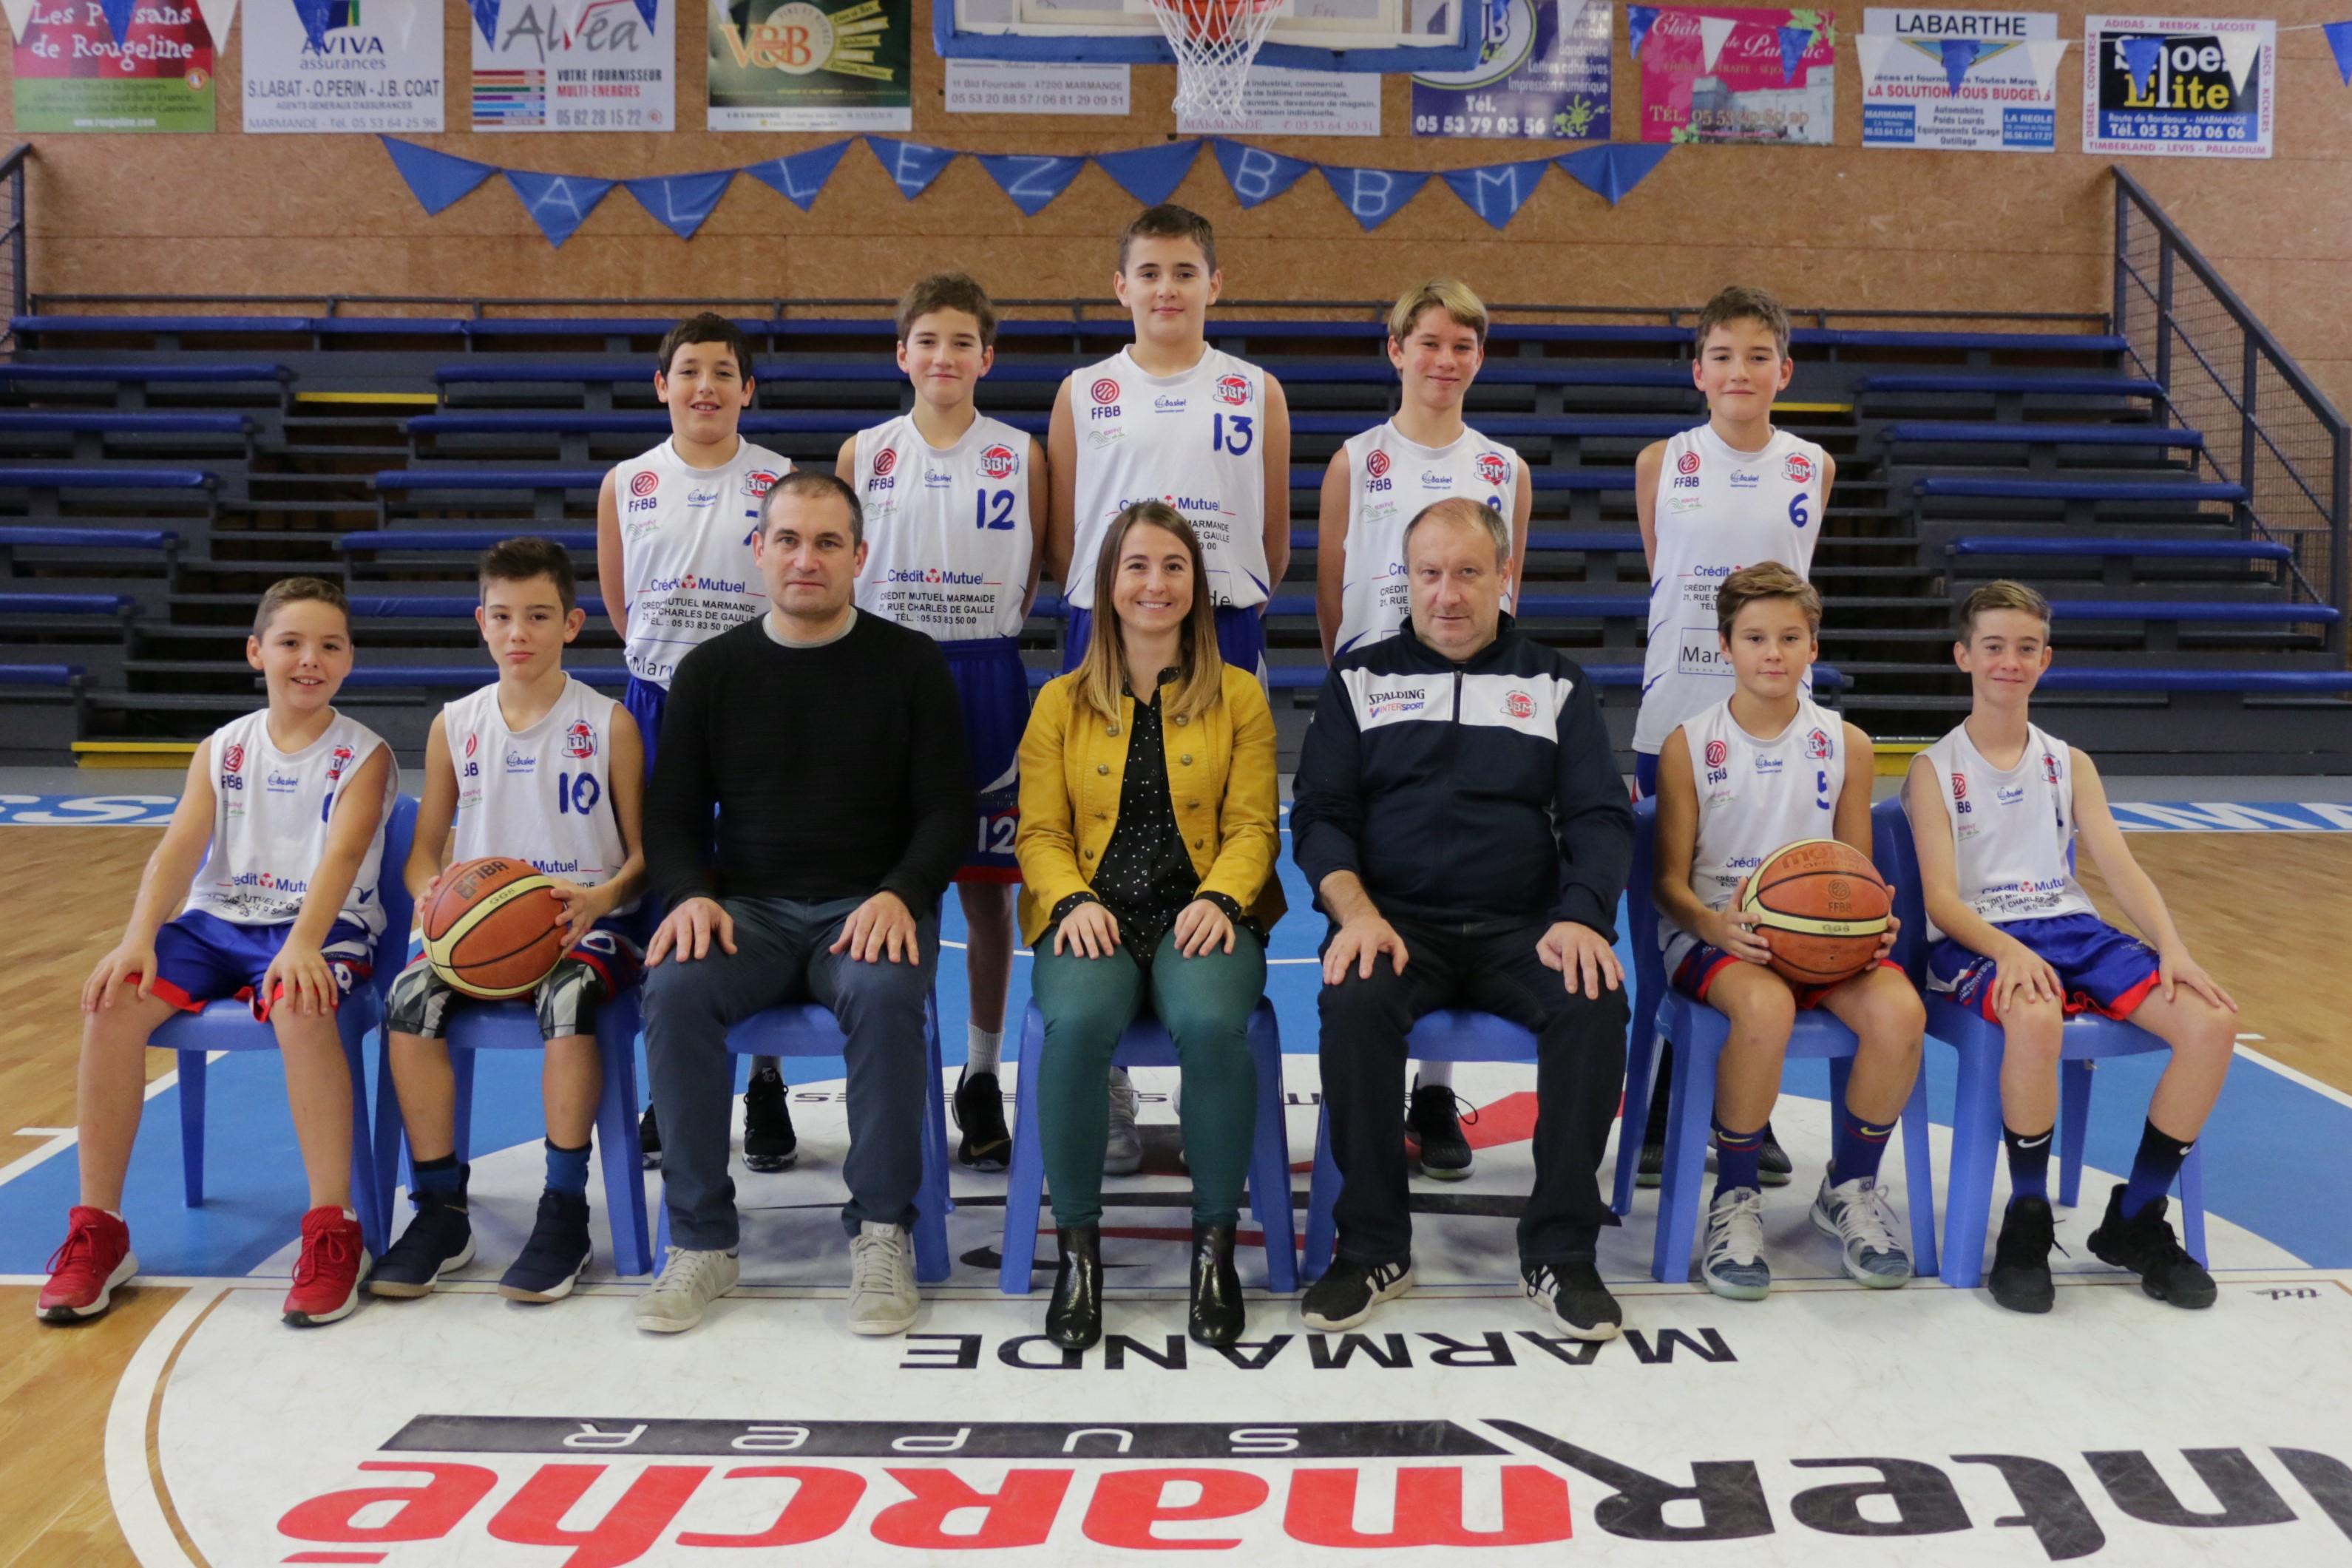 U13m Bbm Garonne Ctc Les Asptt Équipes Basket rodxBCe